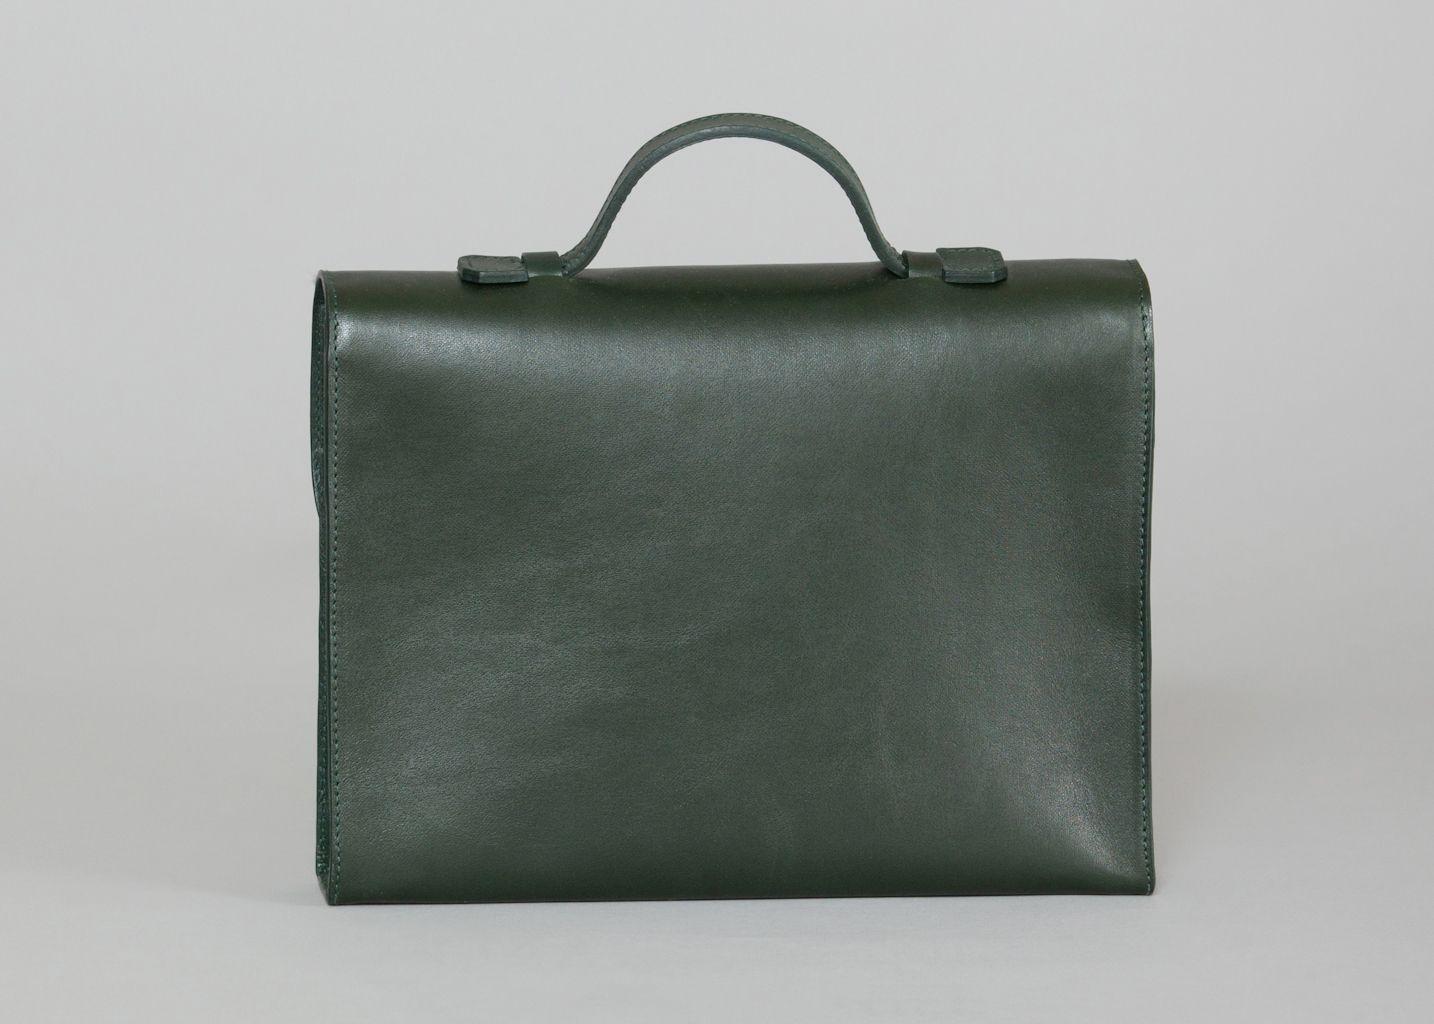 BEV Messenger Bag - De Rigueur